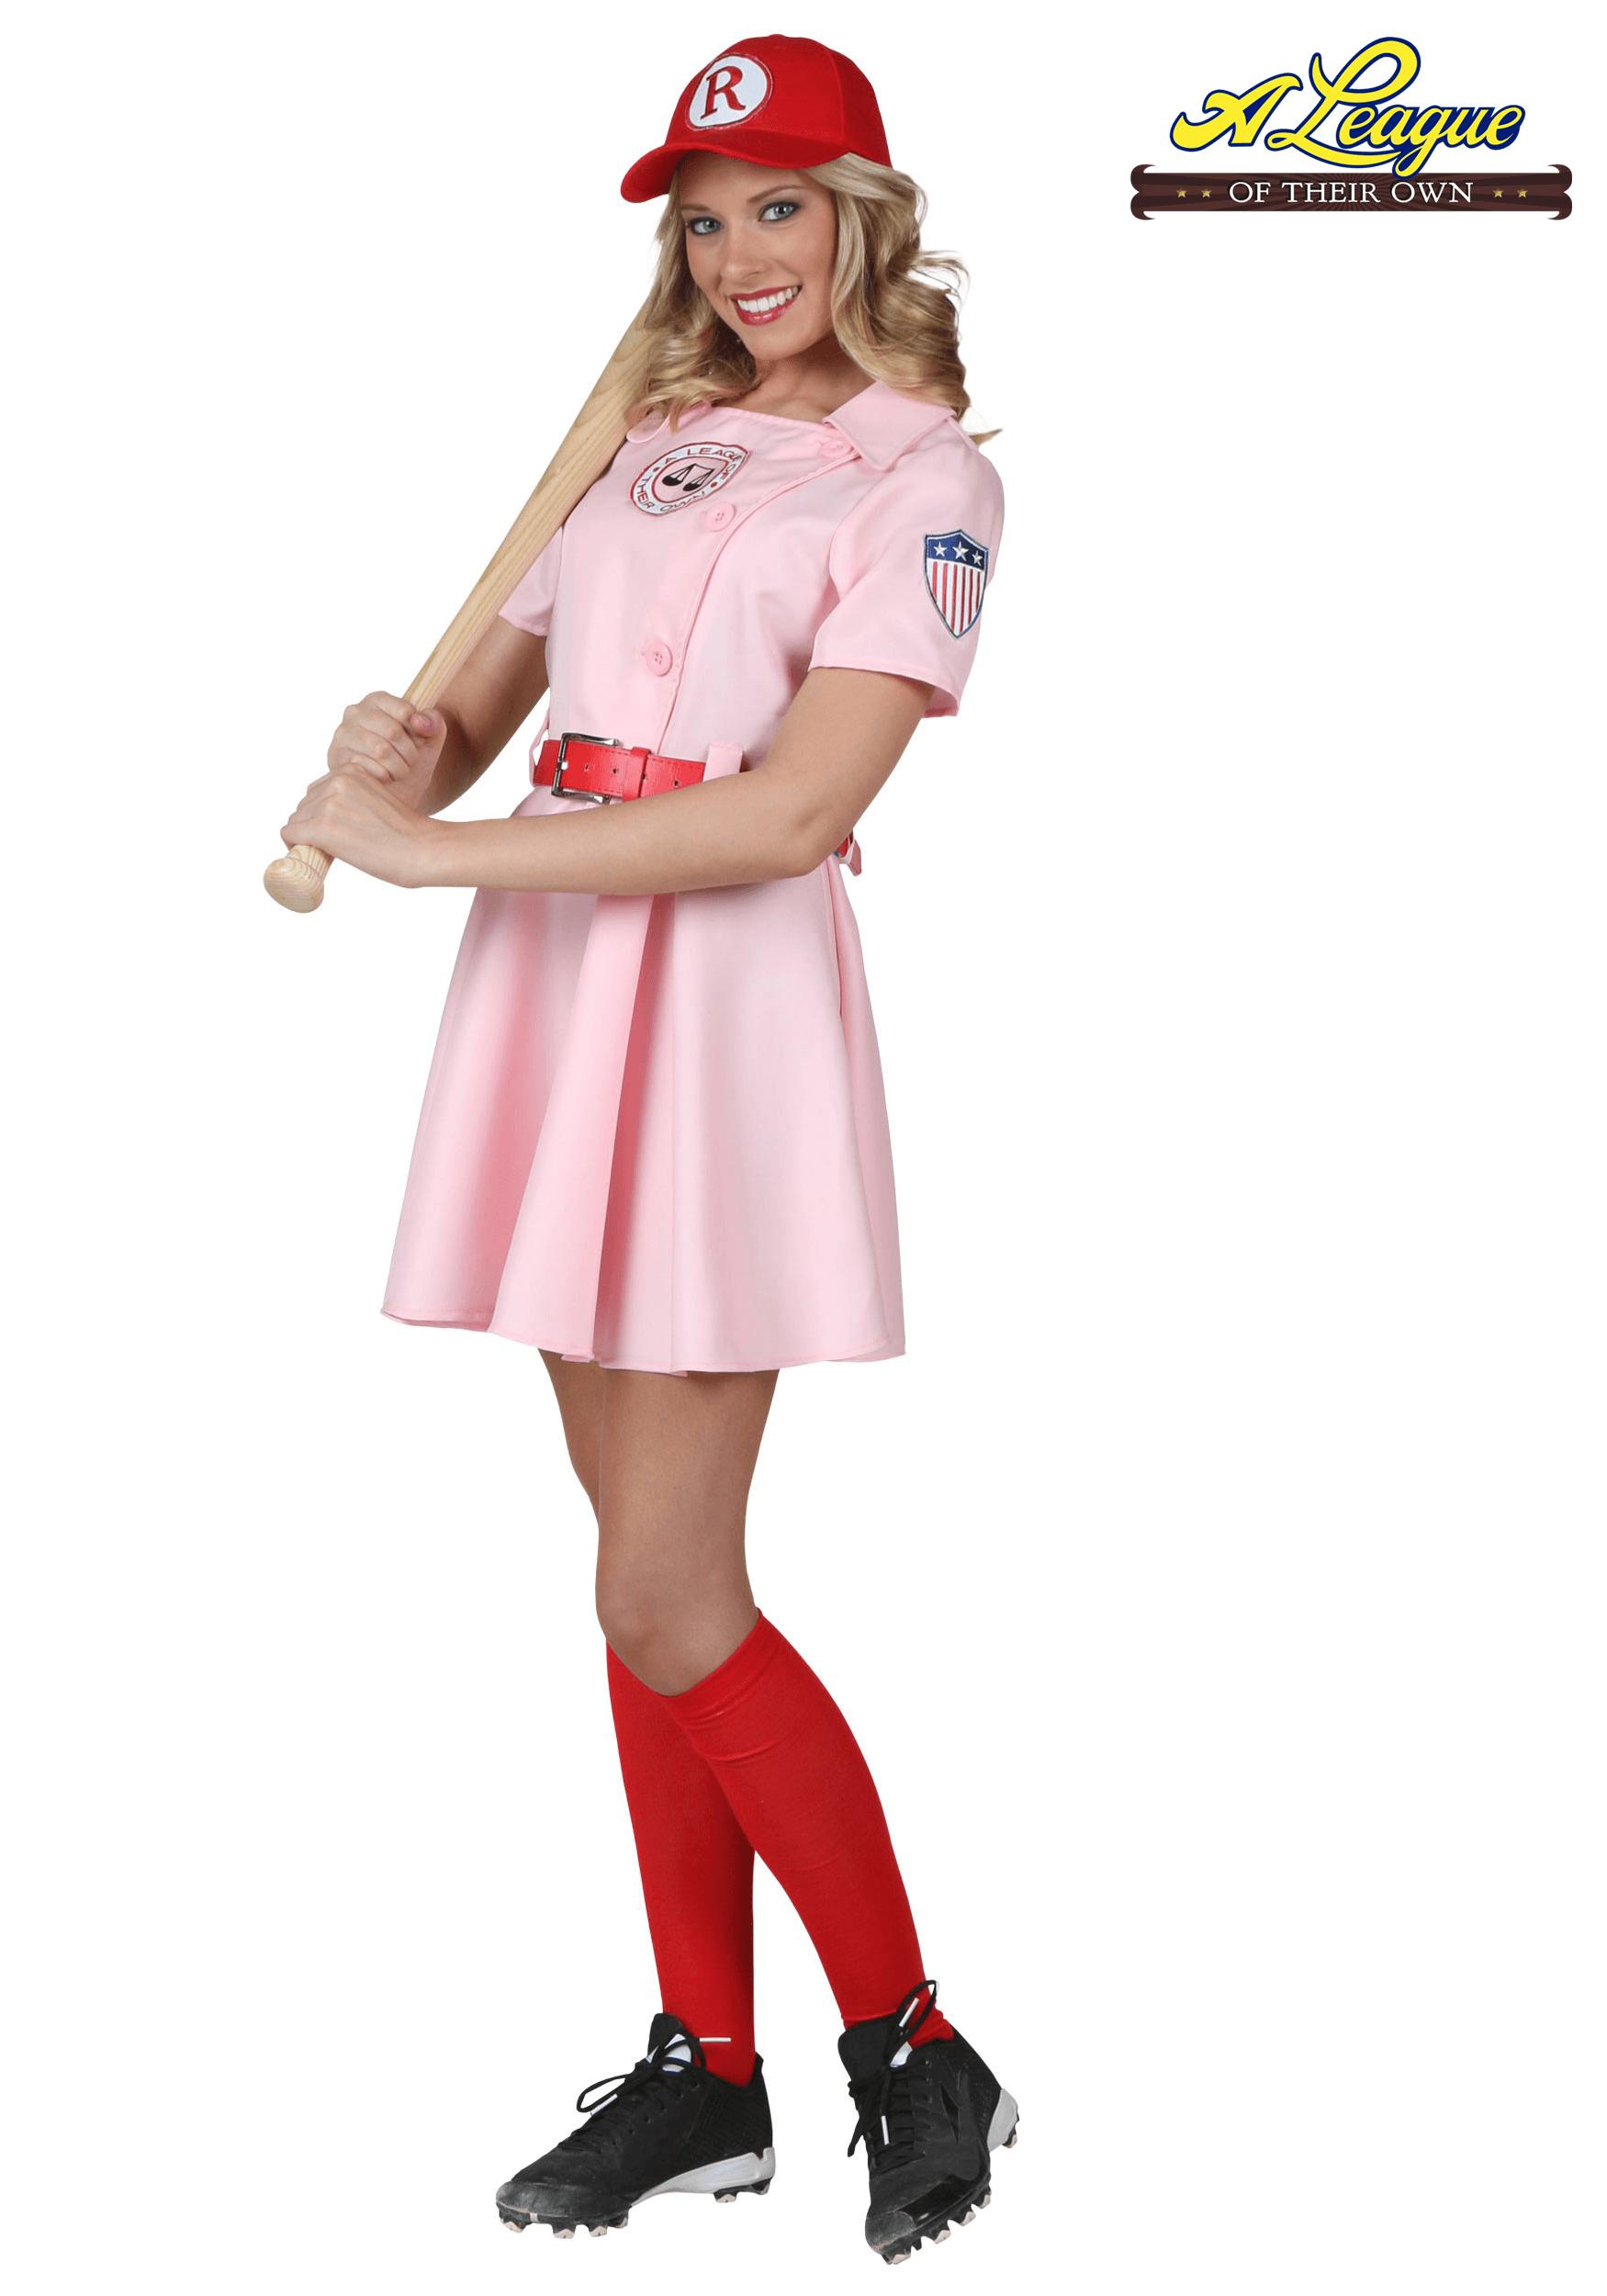 plus size league of their own dottie costume - Cheap Plus Size Halloween Costumes 4x